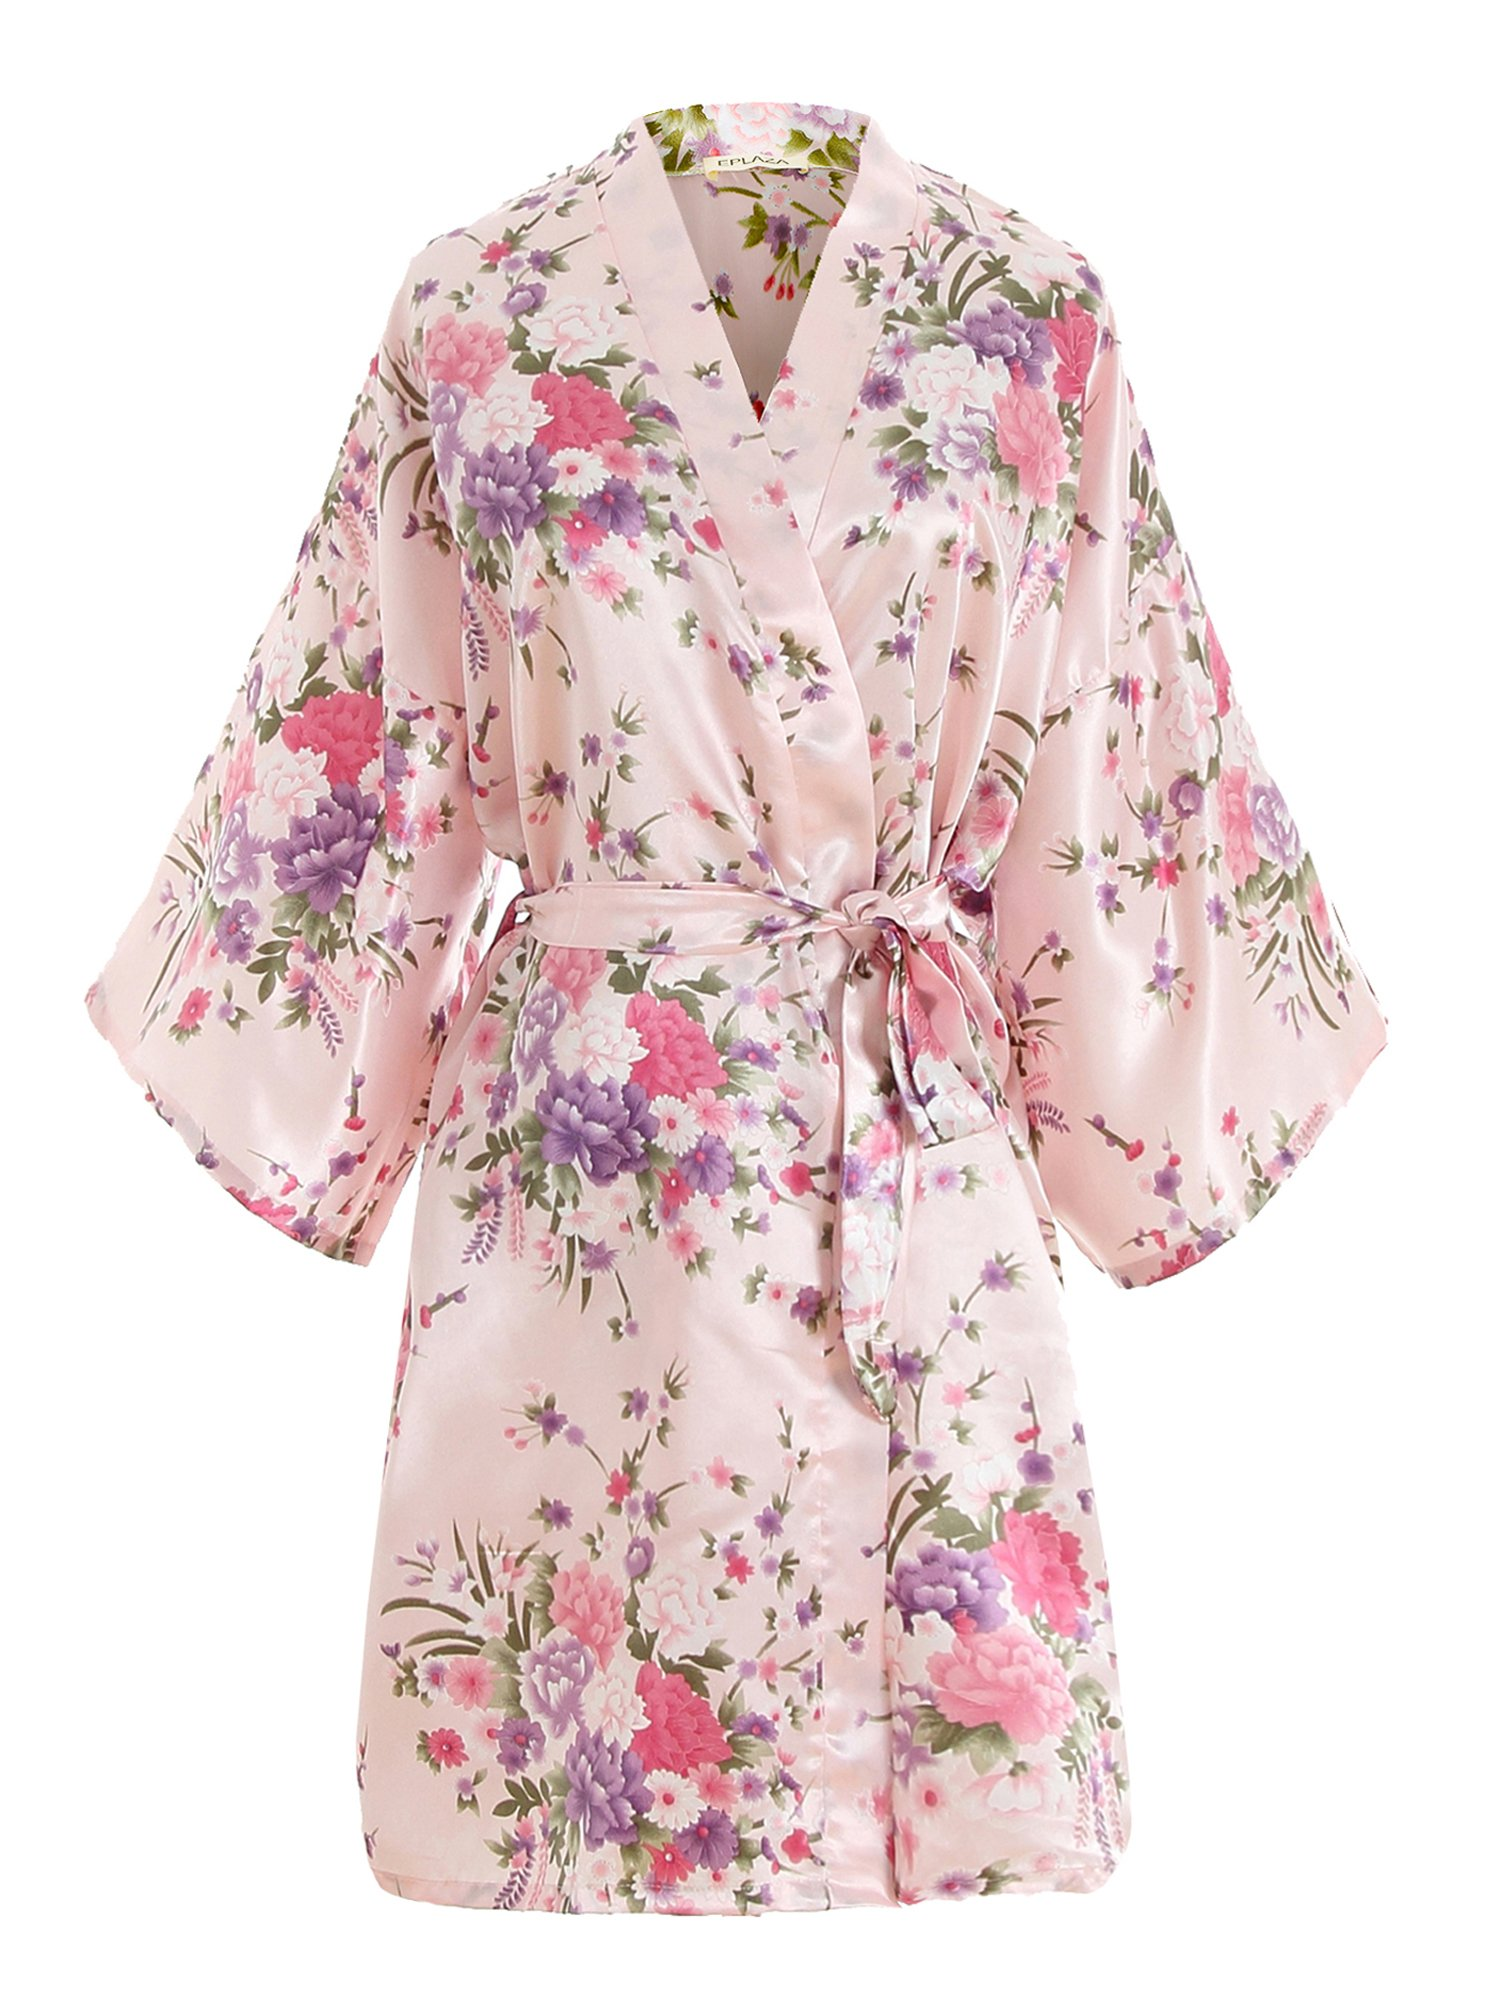 EPLAZA Women Floral Satin Robe Bridal Dressing Gown Wedding Bride Bridesmaid Kimono Sleepwear (Pink)